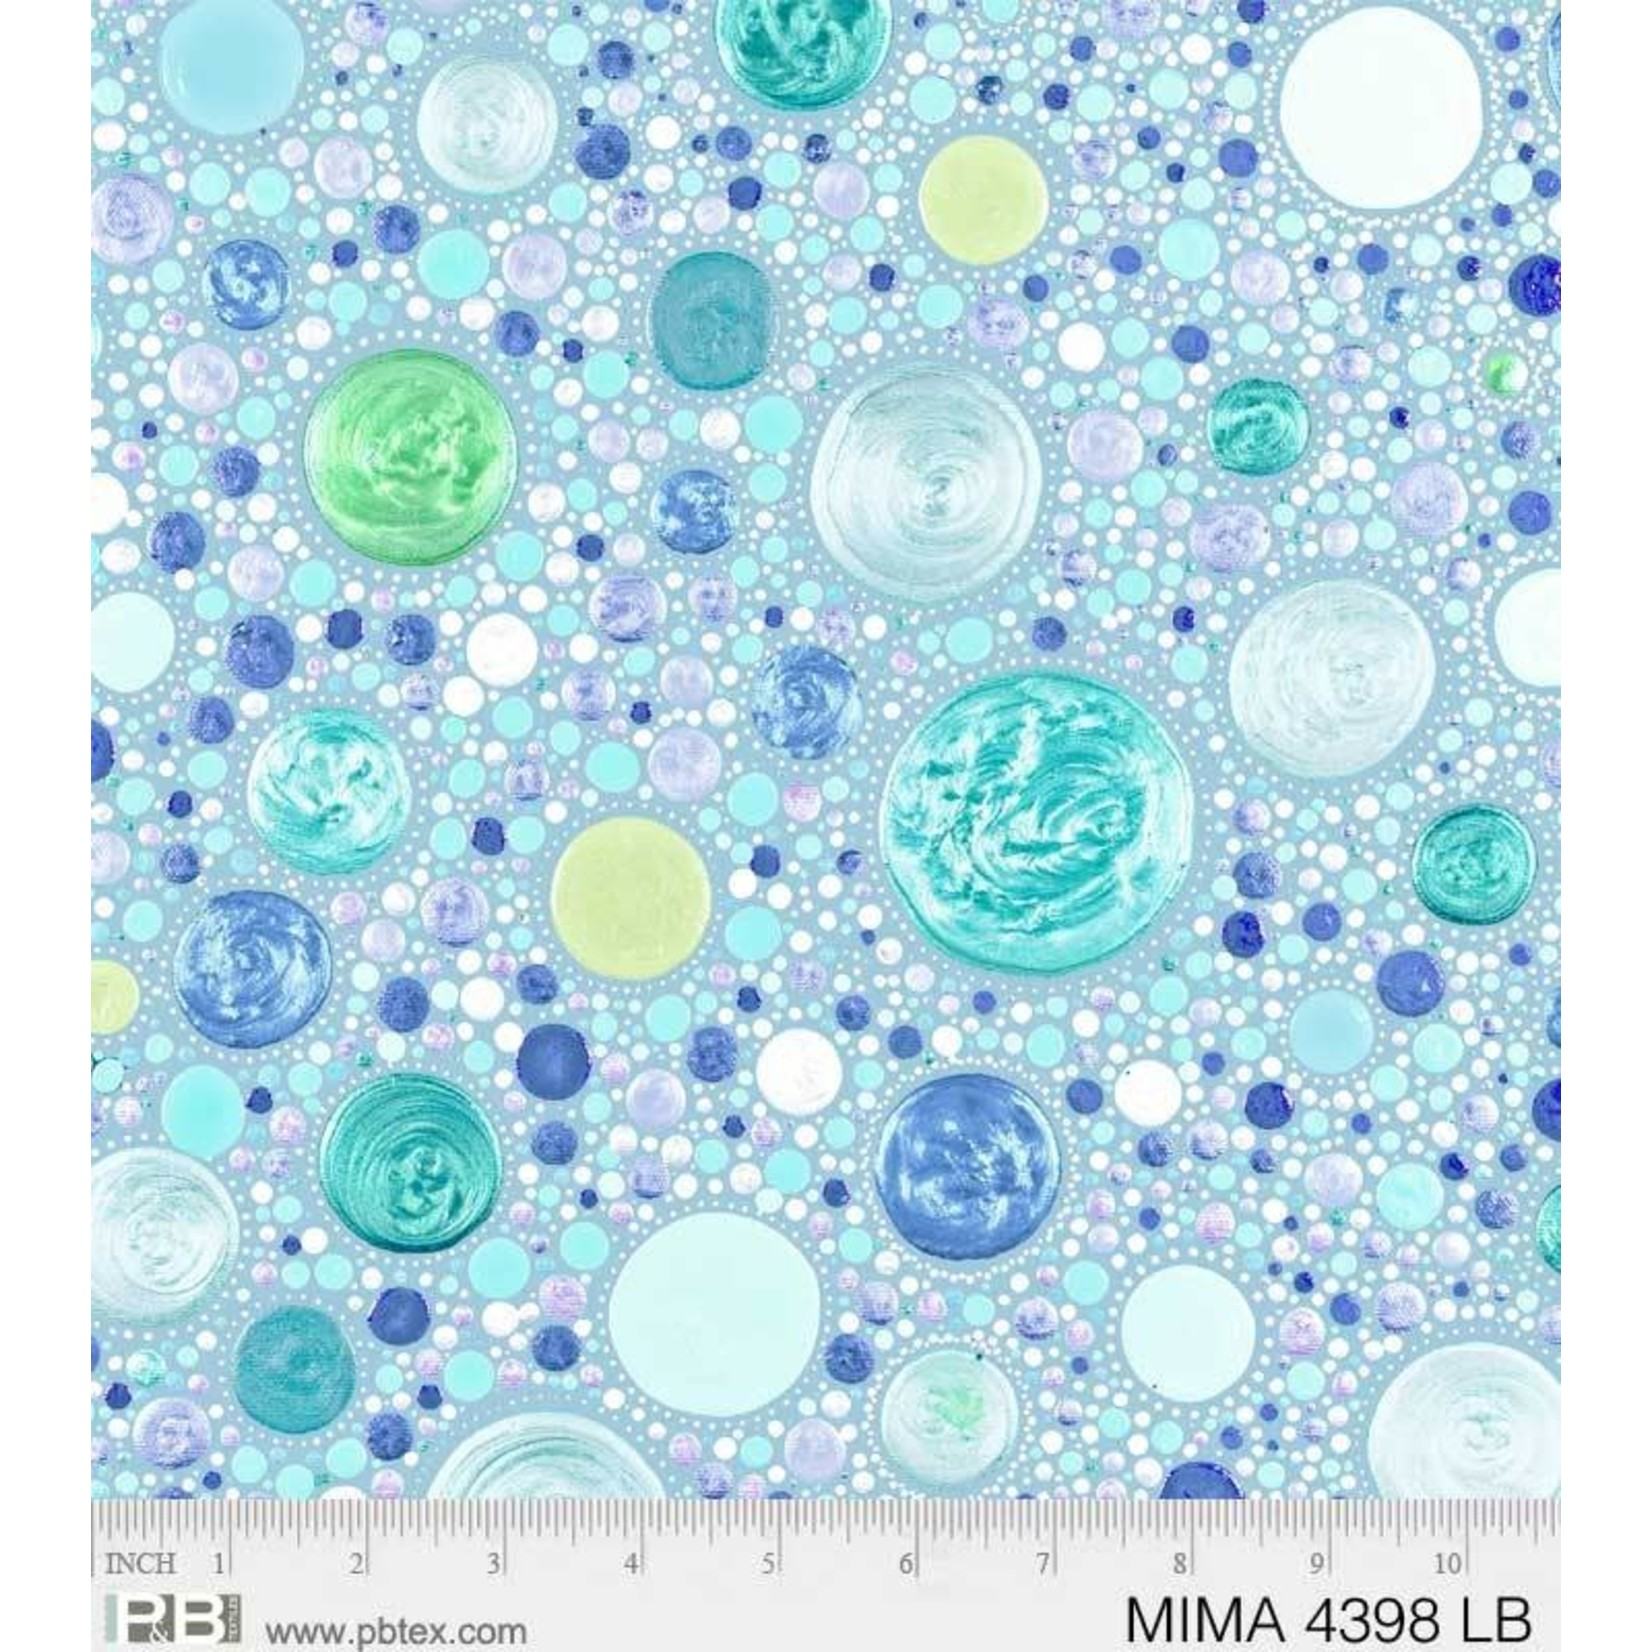 P&B Textiles Mindful Mandalas - Stones - Light Blue